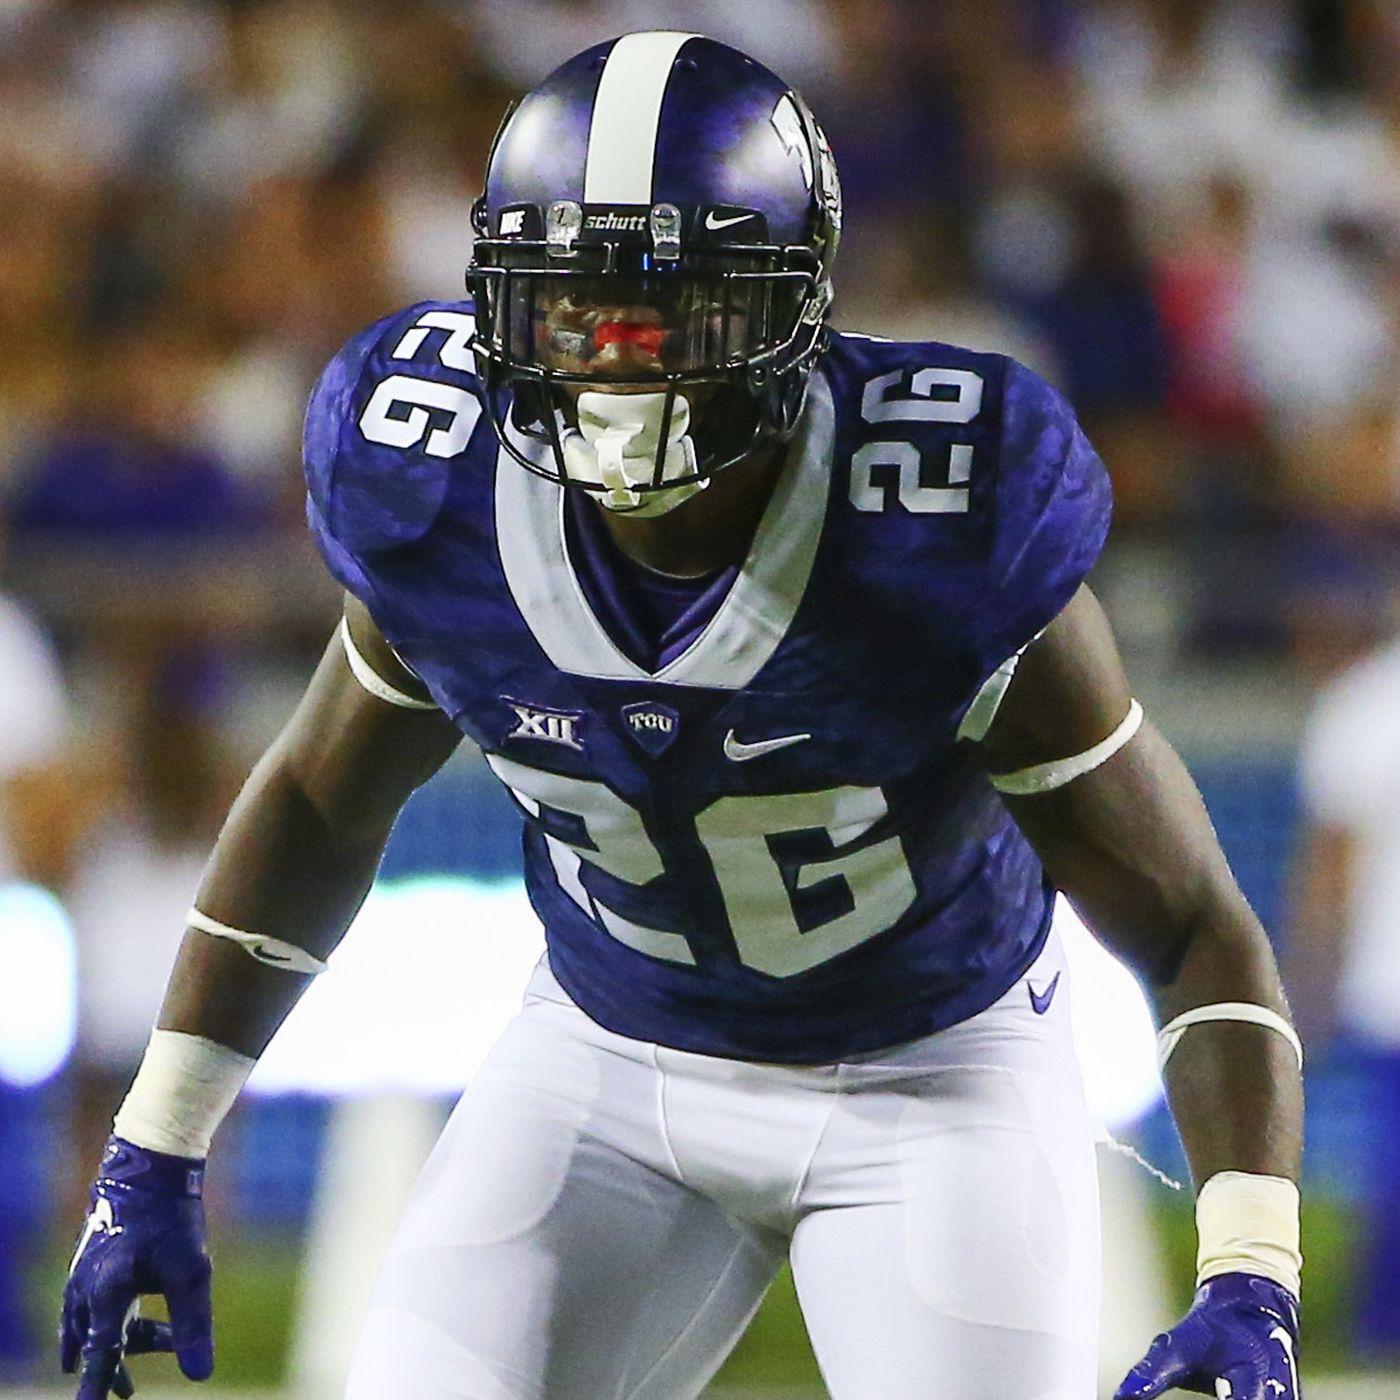 buy popular fcdf3 f1ad1 2016 NFL Draft: Cleveland Browns Pick S Derrick Kindred at ...